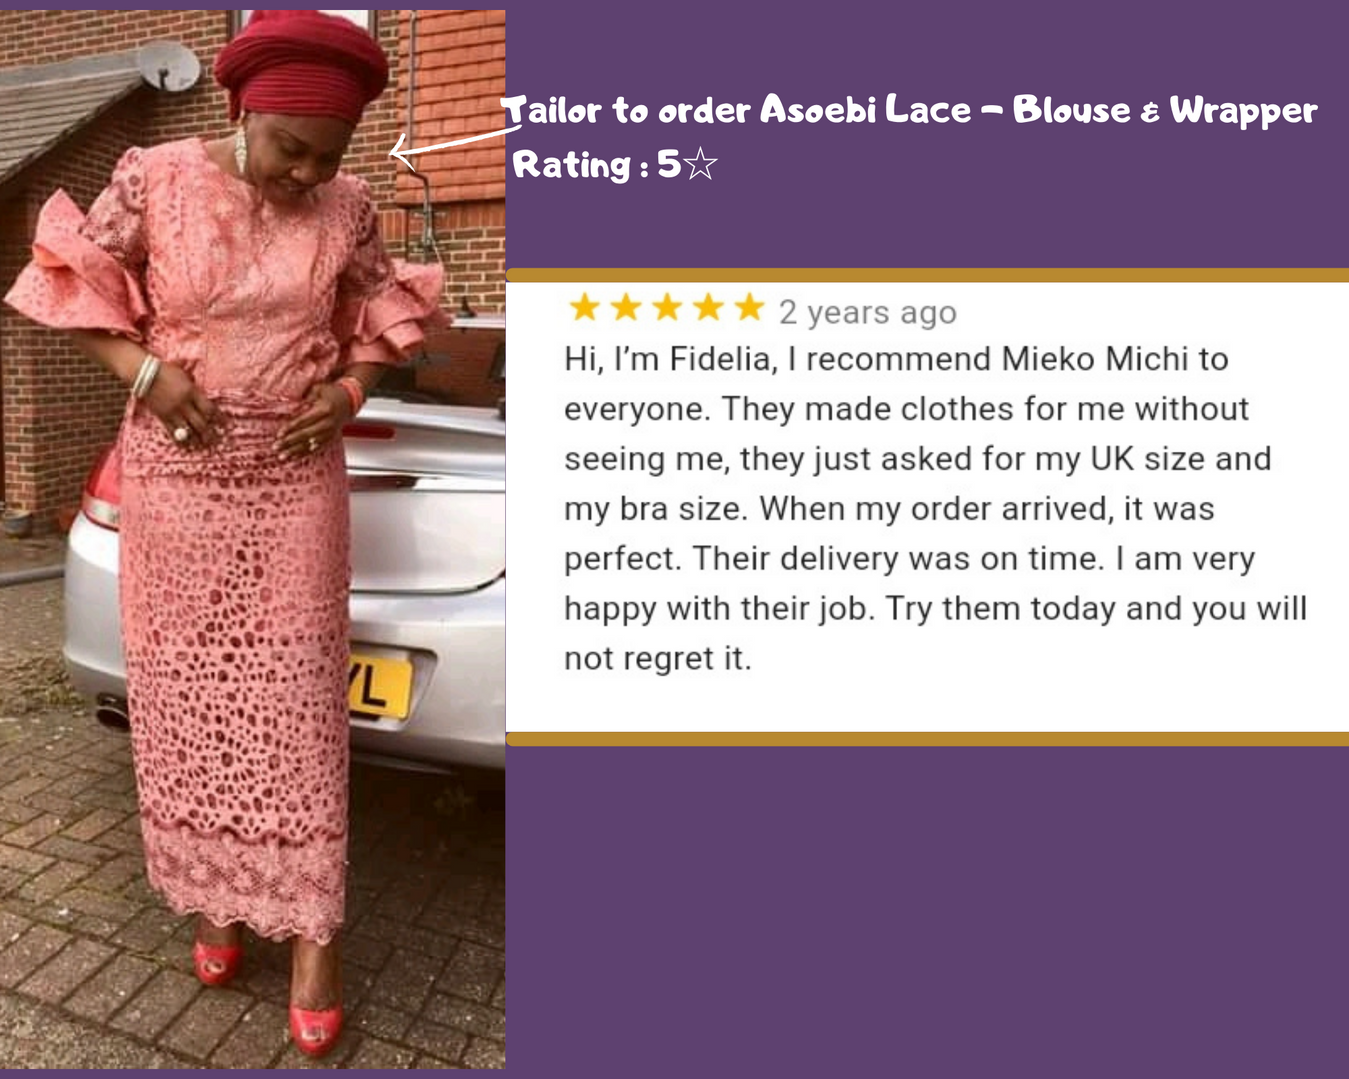 Mieko_Michi_Review_Asoebi_lace_Iro_Blous